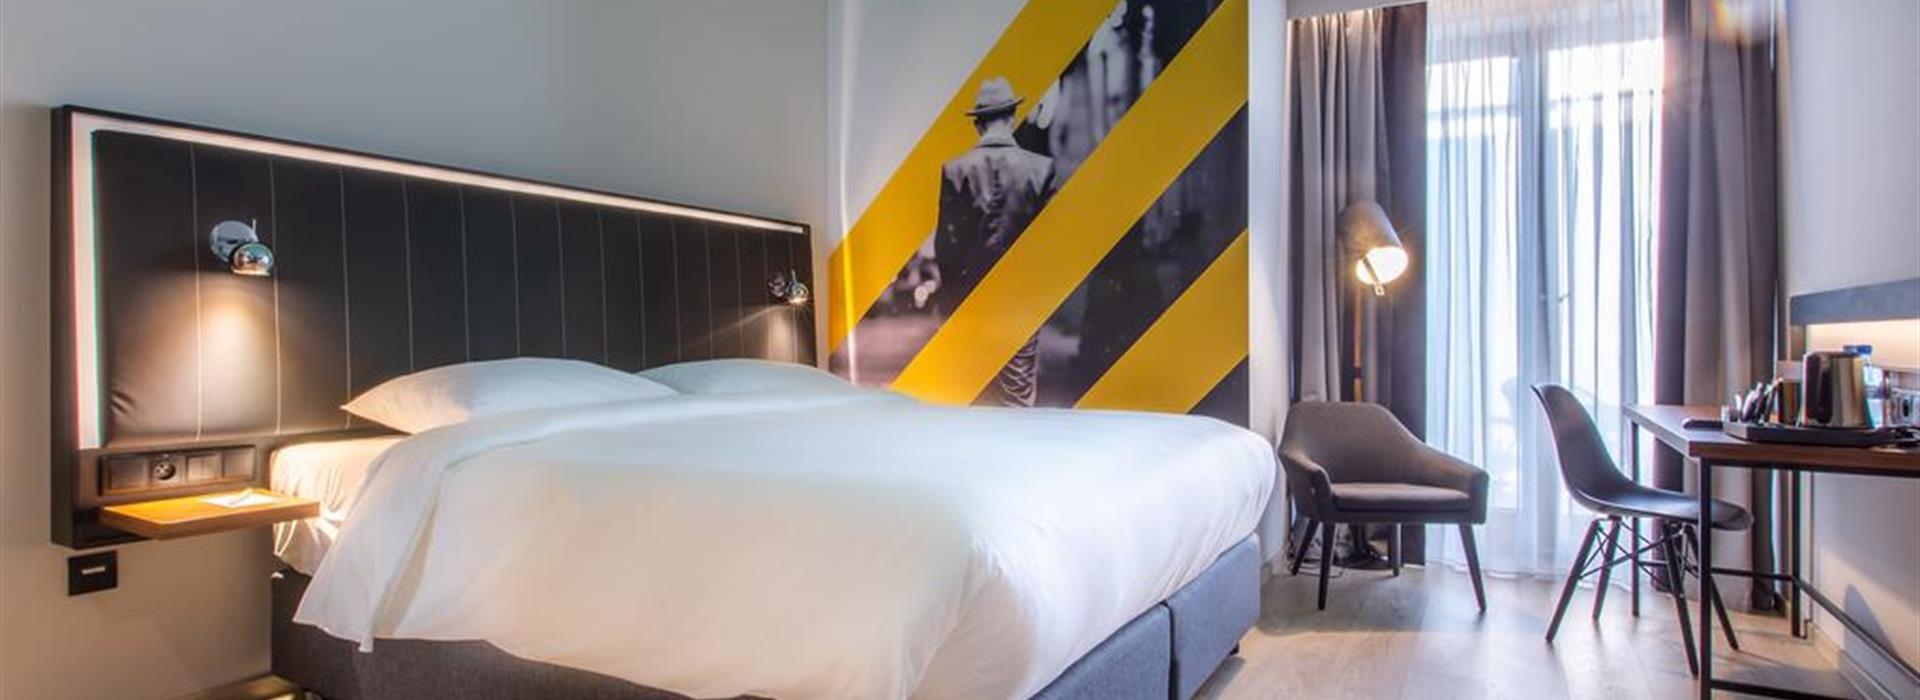 panorama-Hotel-zakreb